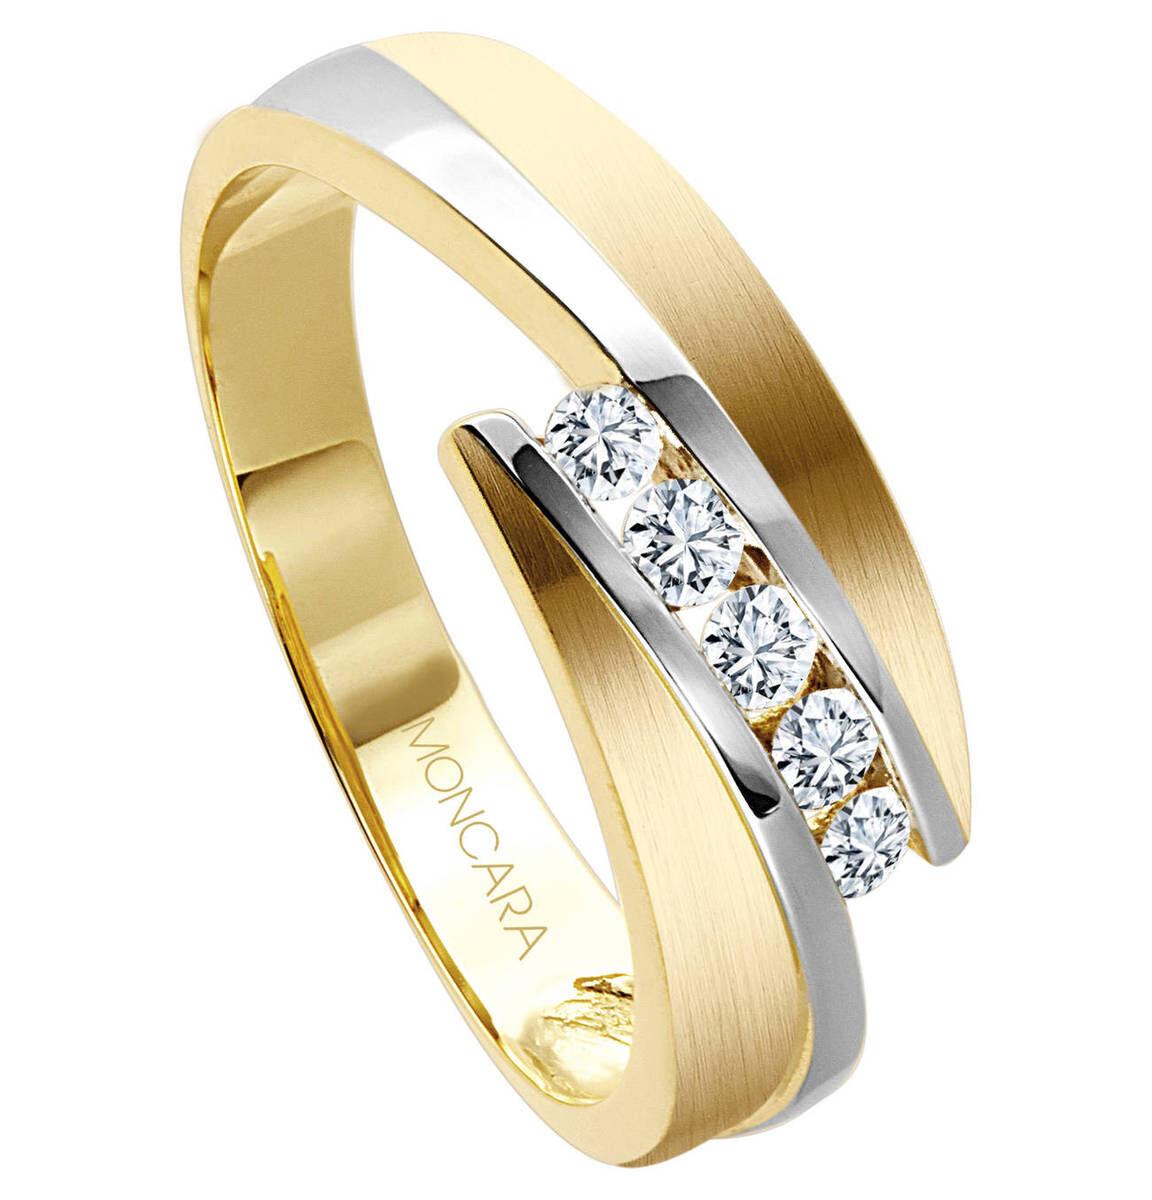 Moncara Damen Ring, 585er Gelbgold mit 5 Diamanten, bicolor